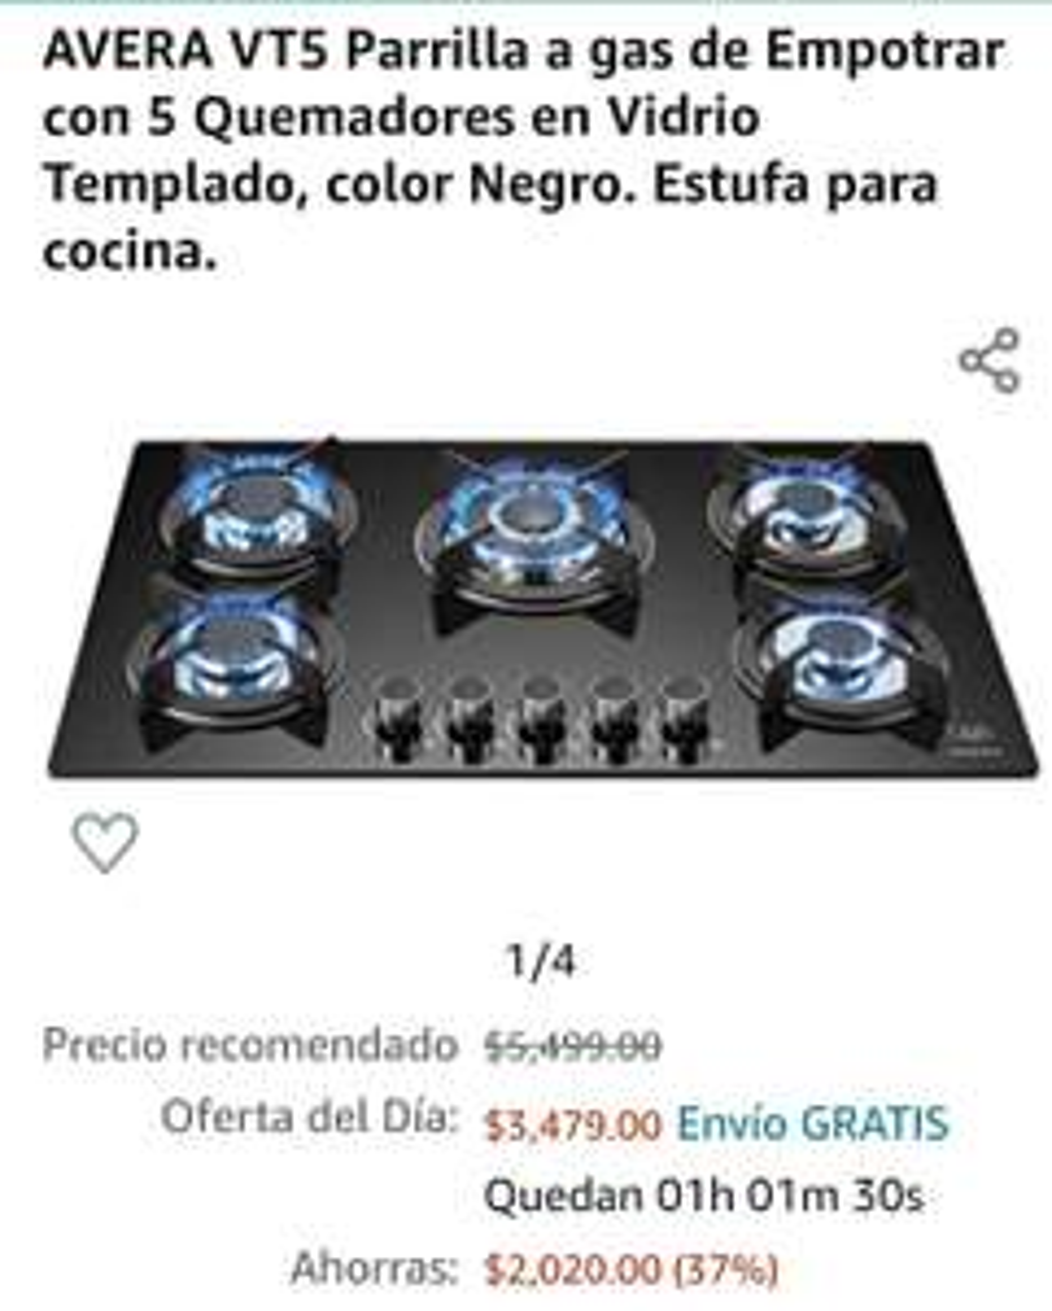 Amazon: Parrilla de 5 quemadores en vidrio templado de $5499 a $3479.00